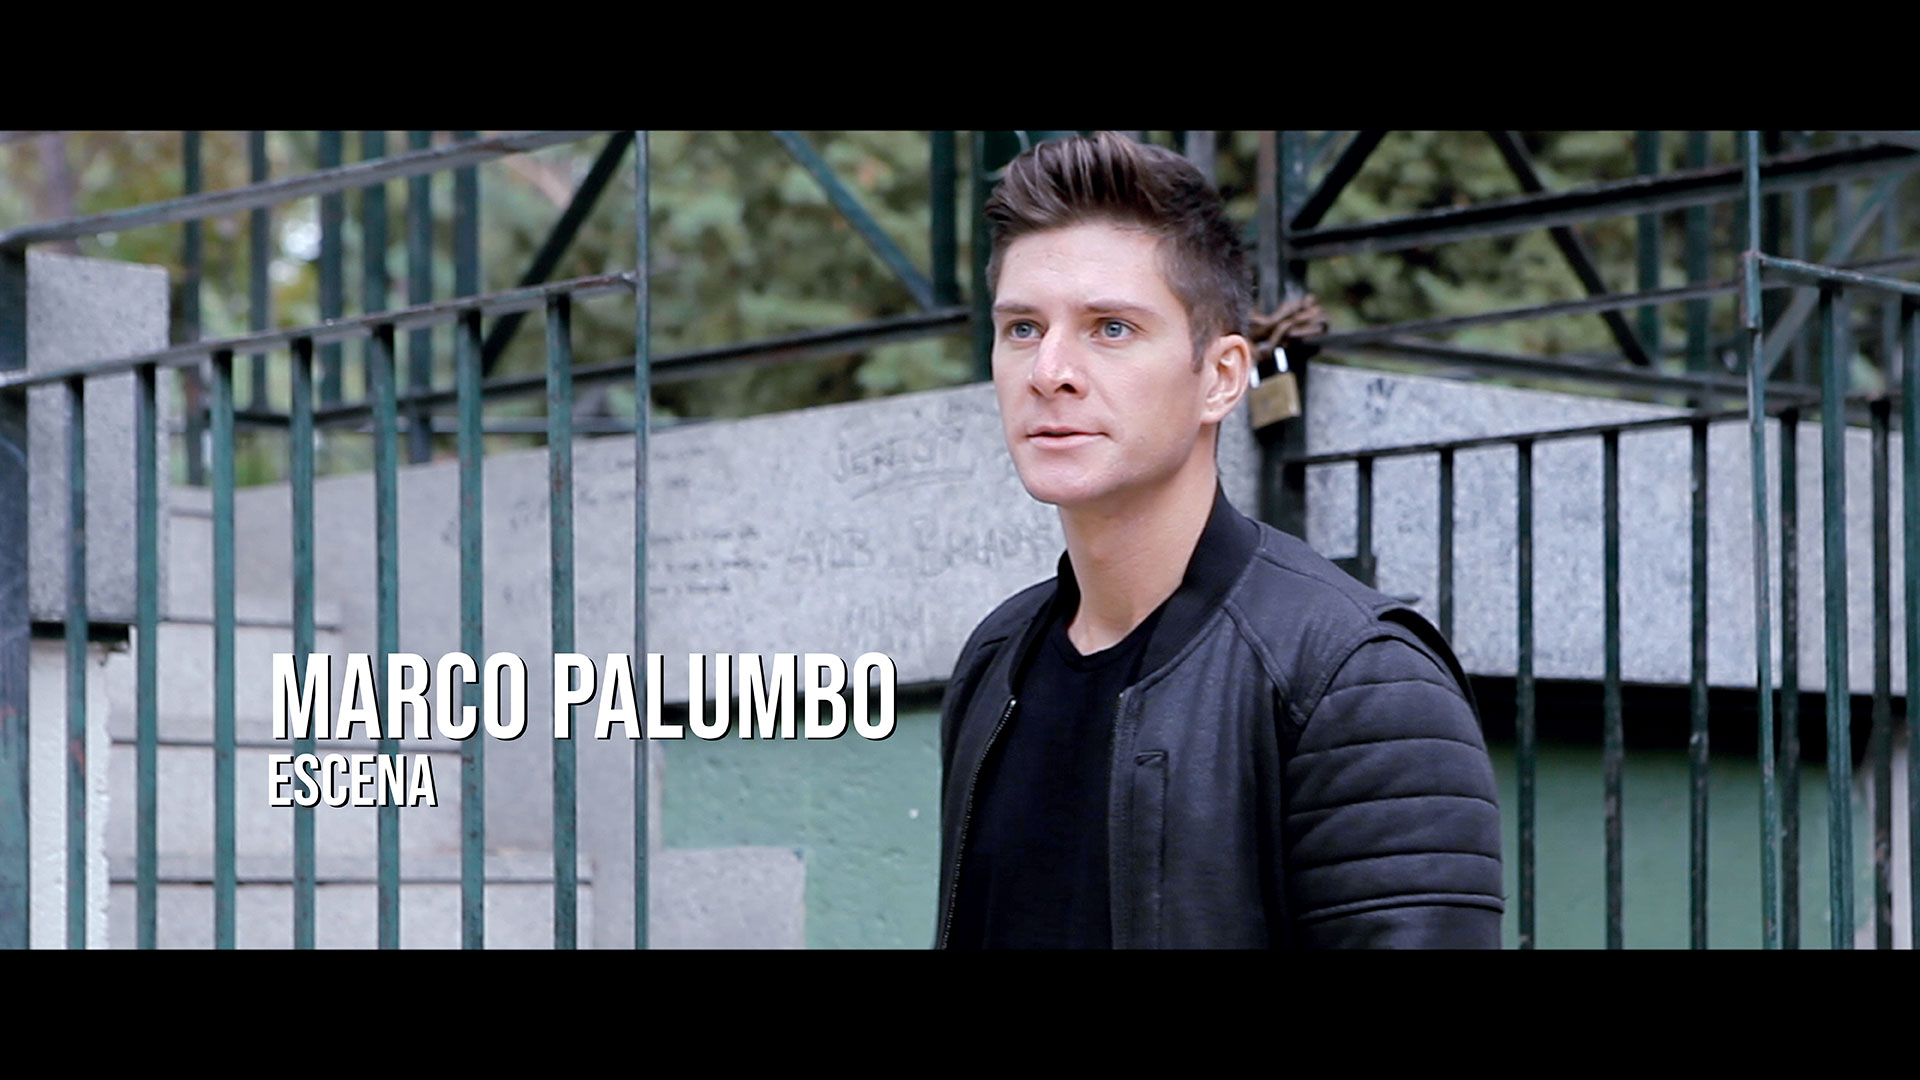 Marco Palumbo - Escena Actor